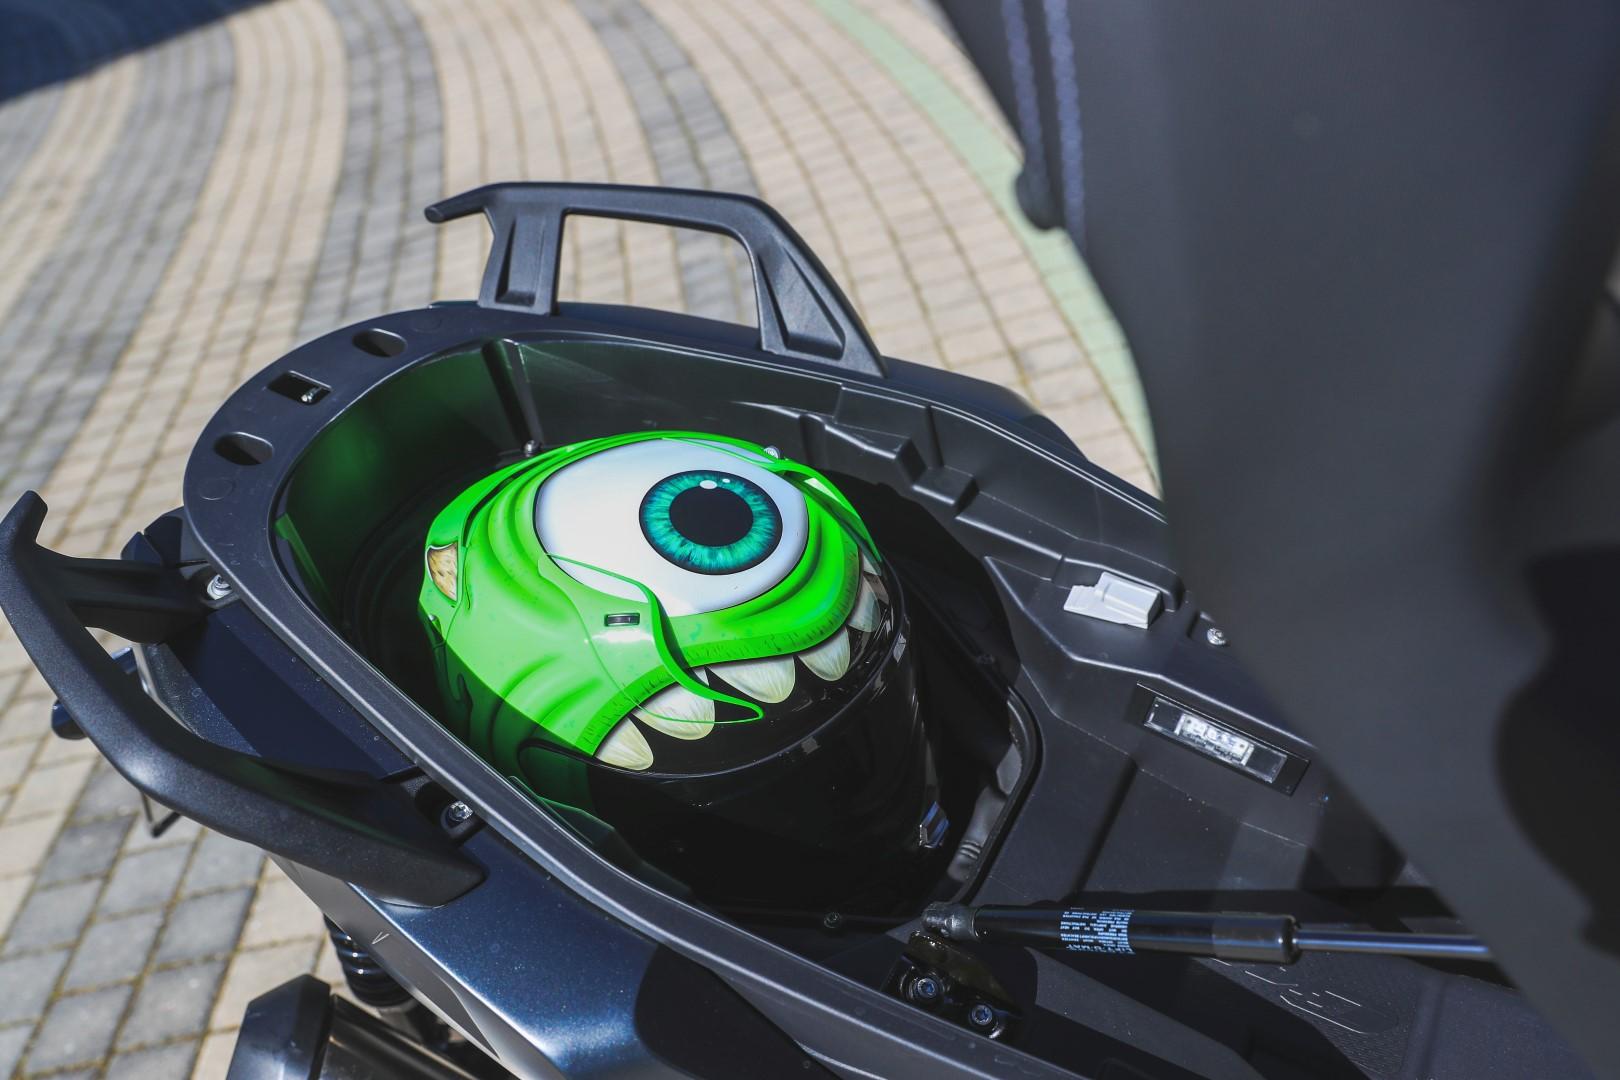 Comparativa Scooter 400: BMW C 400 X, KYMCO Xciting 400, Suzuki Burgman 400, Yamaha XMAX 400